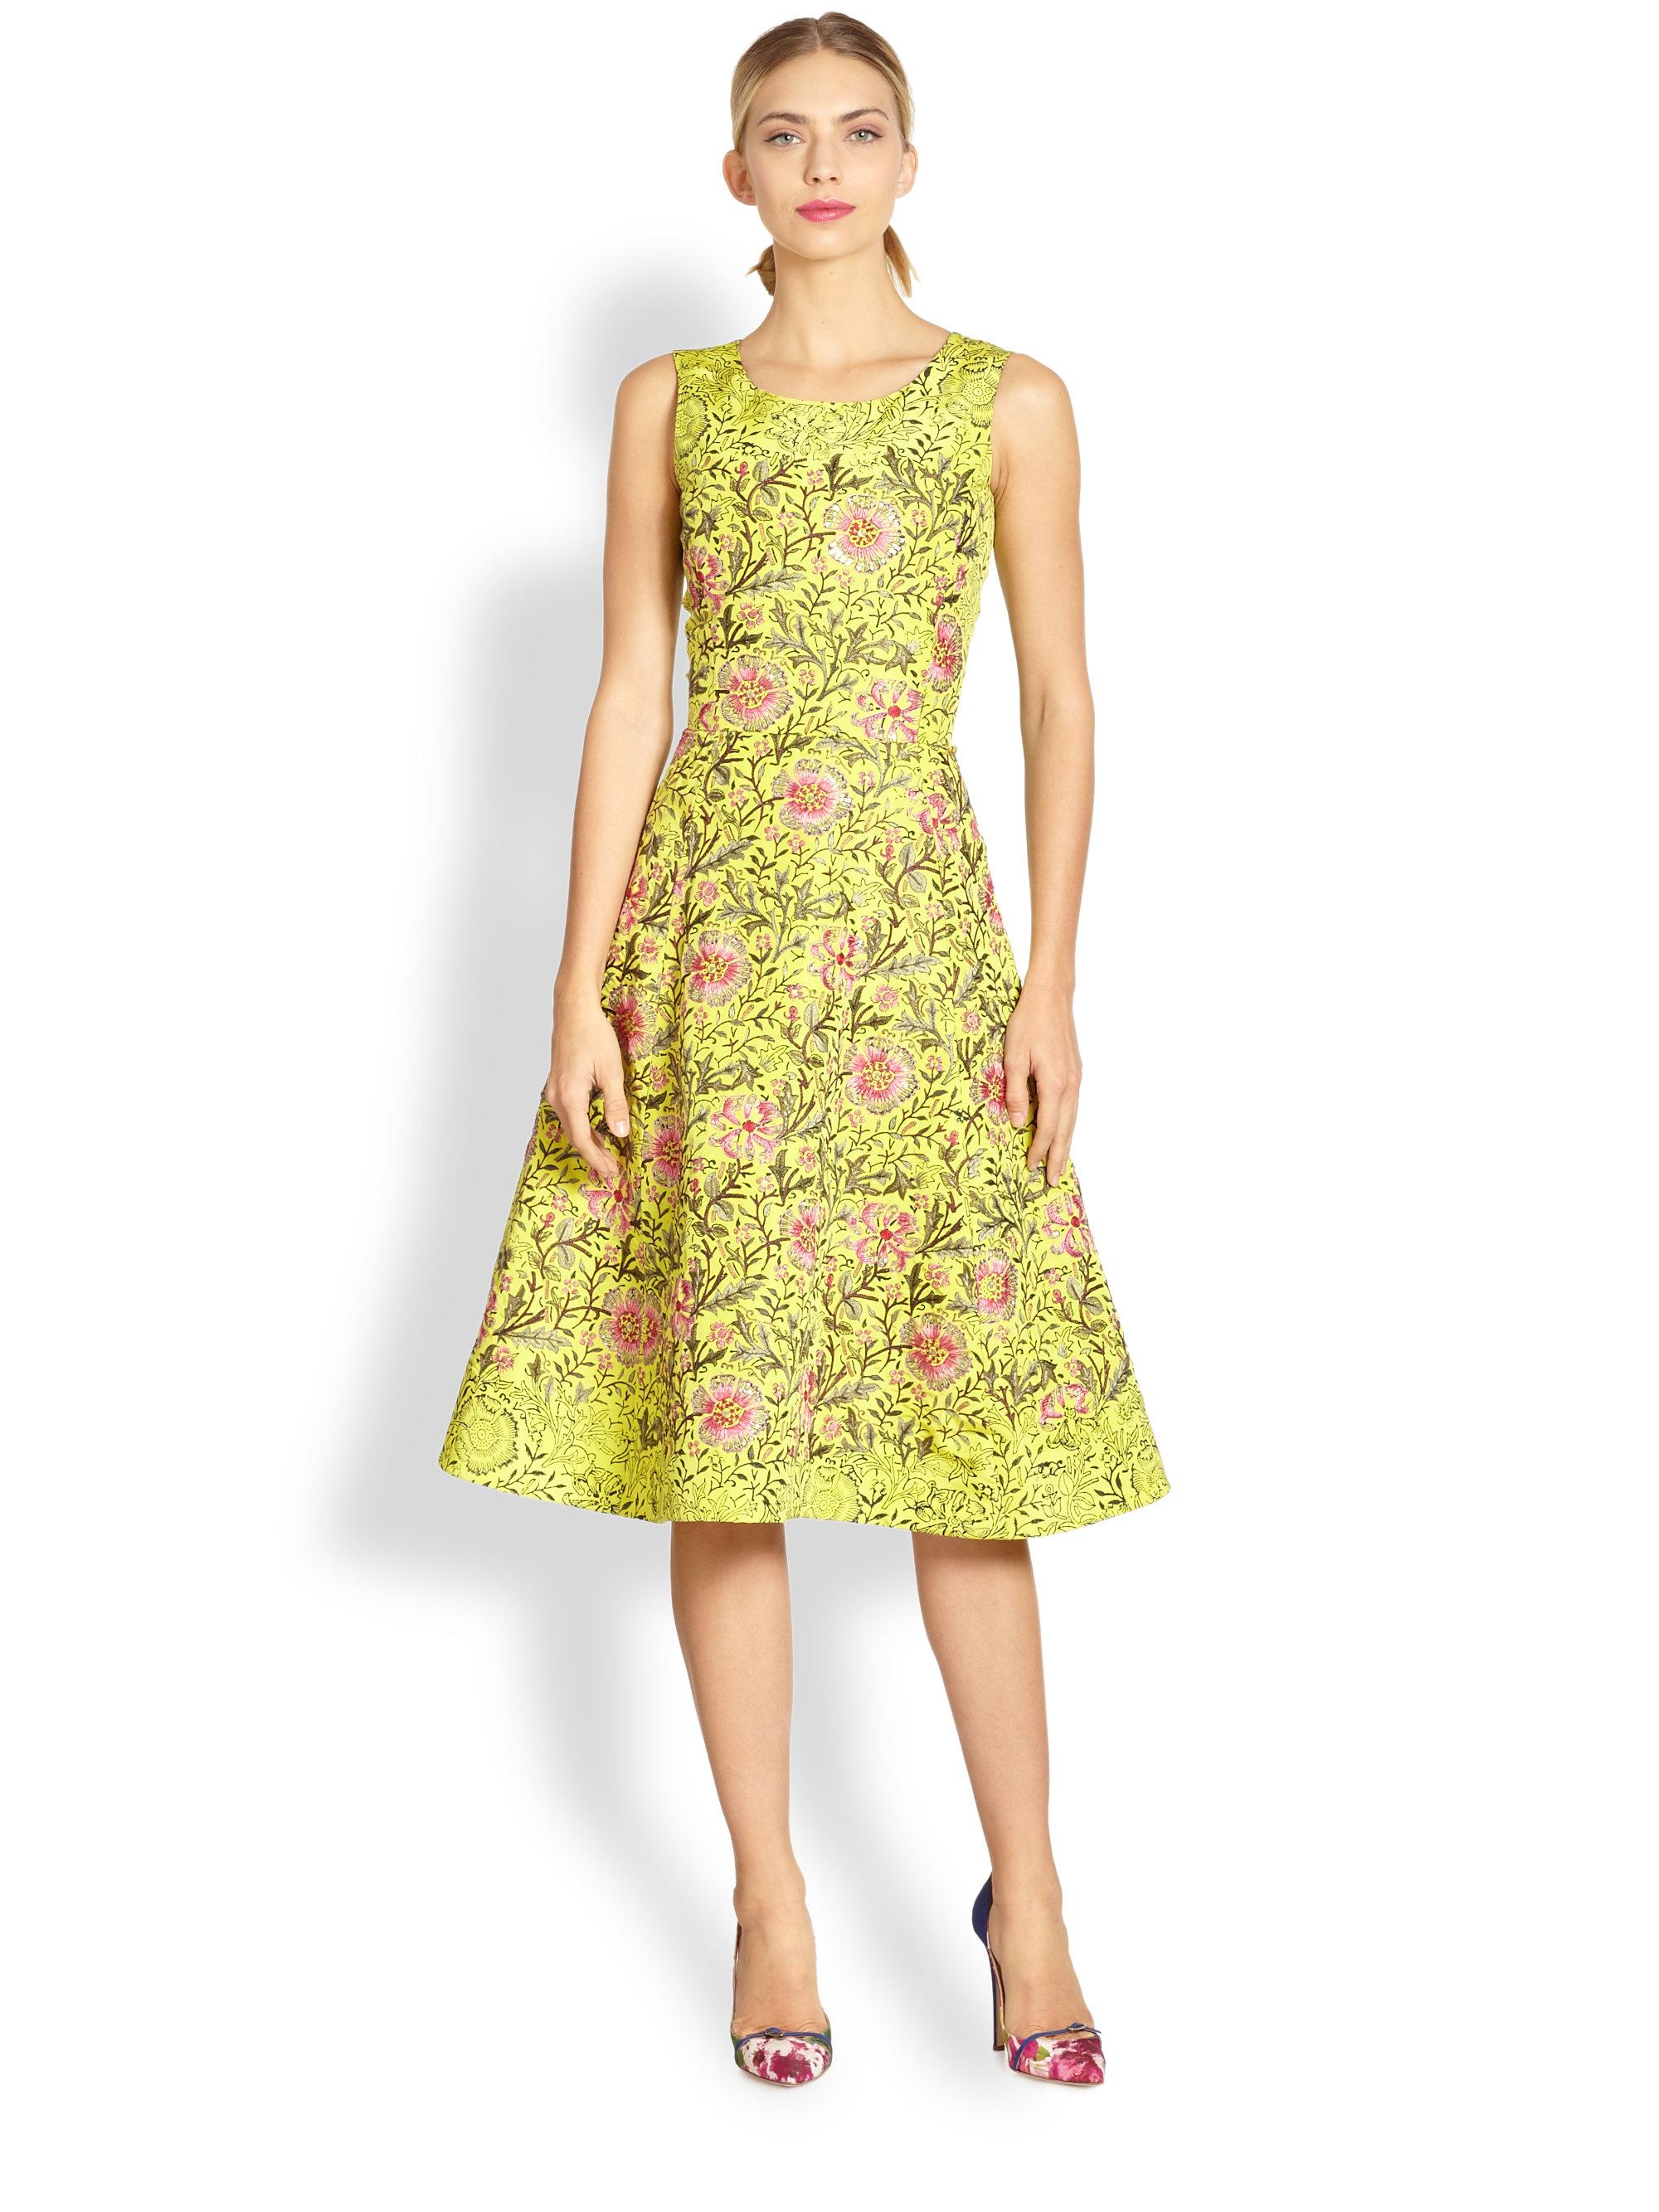 Lyst Oscar De La Renta Silk Floral Embroidery Dress In Yellow